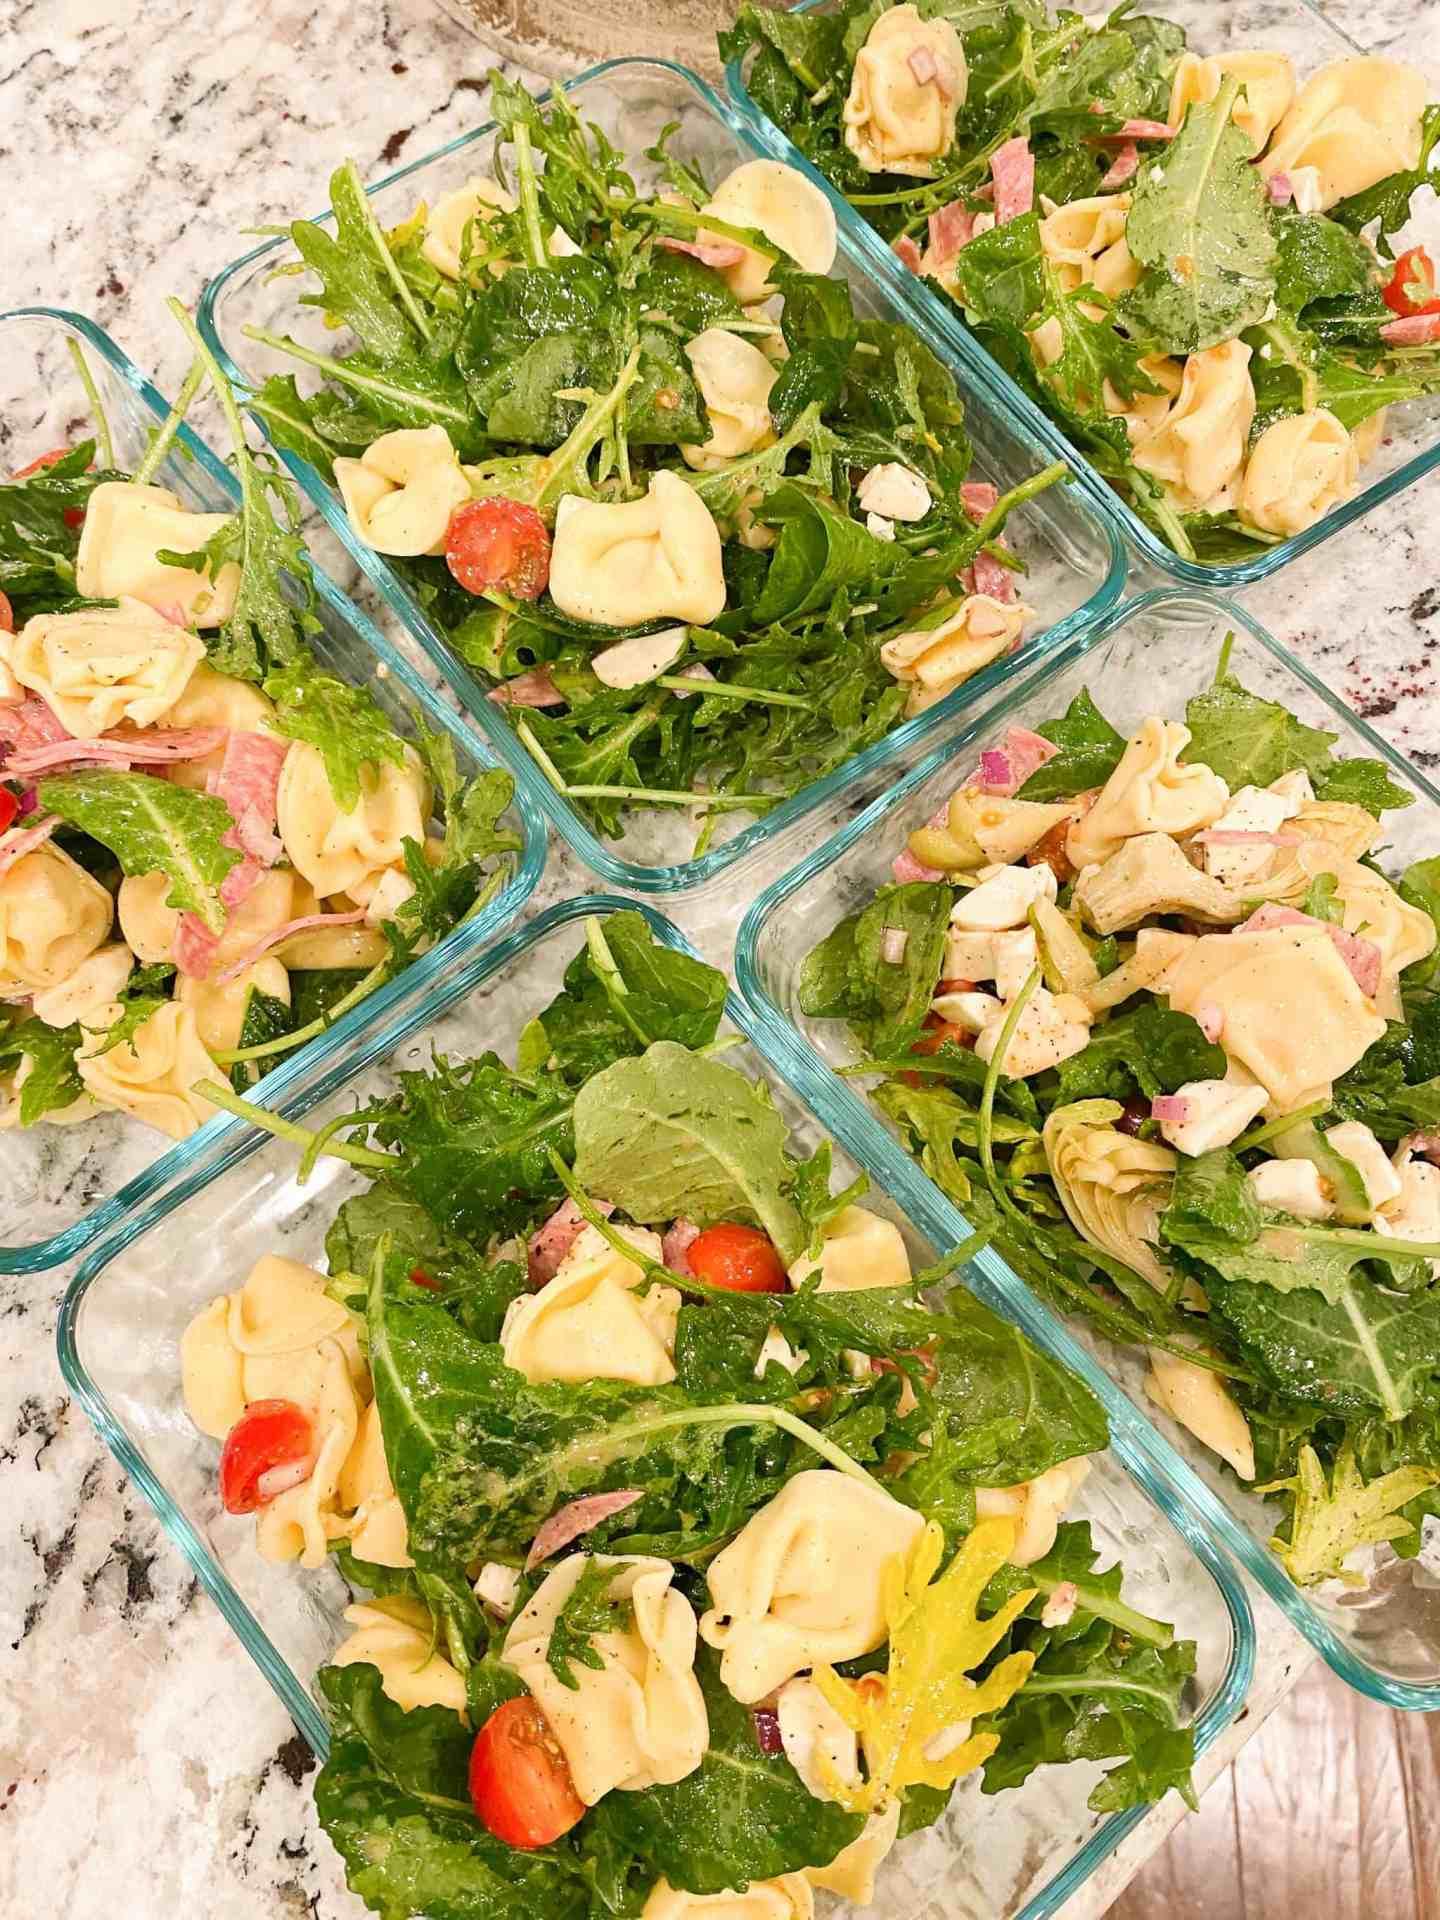 Tortellini-and-Antipasto-Salad-with-Italian-Vinaigrette-easy-lunch